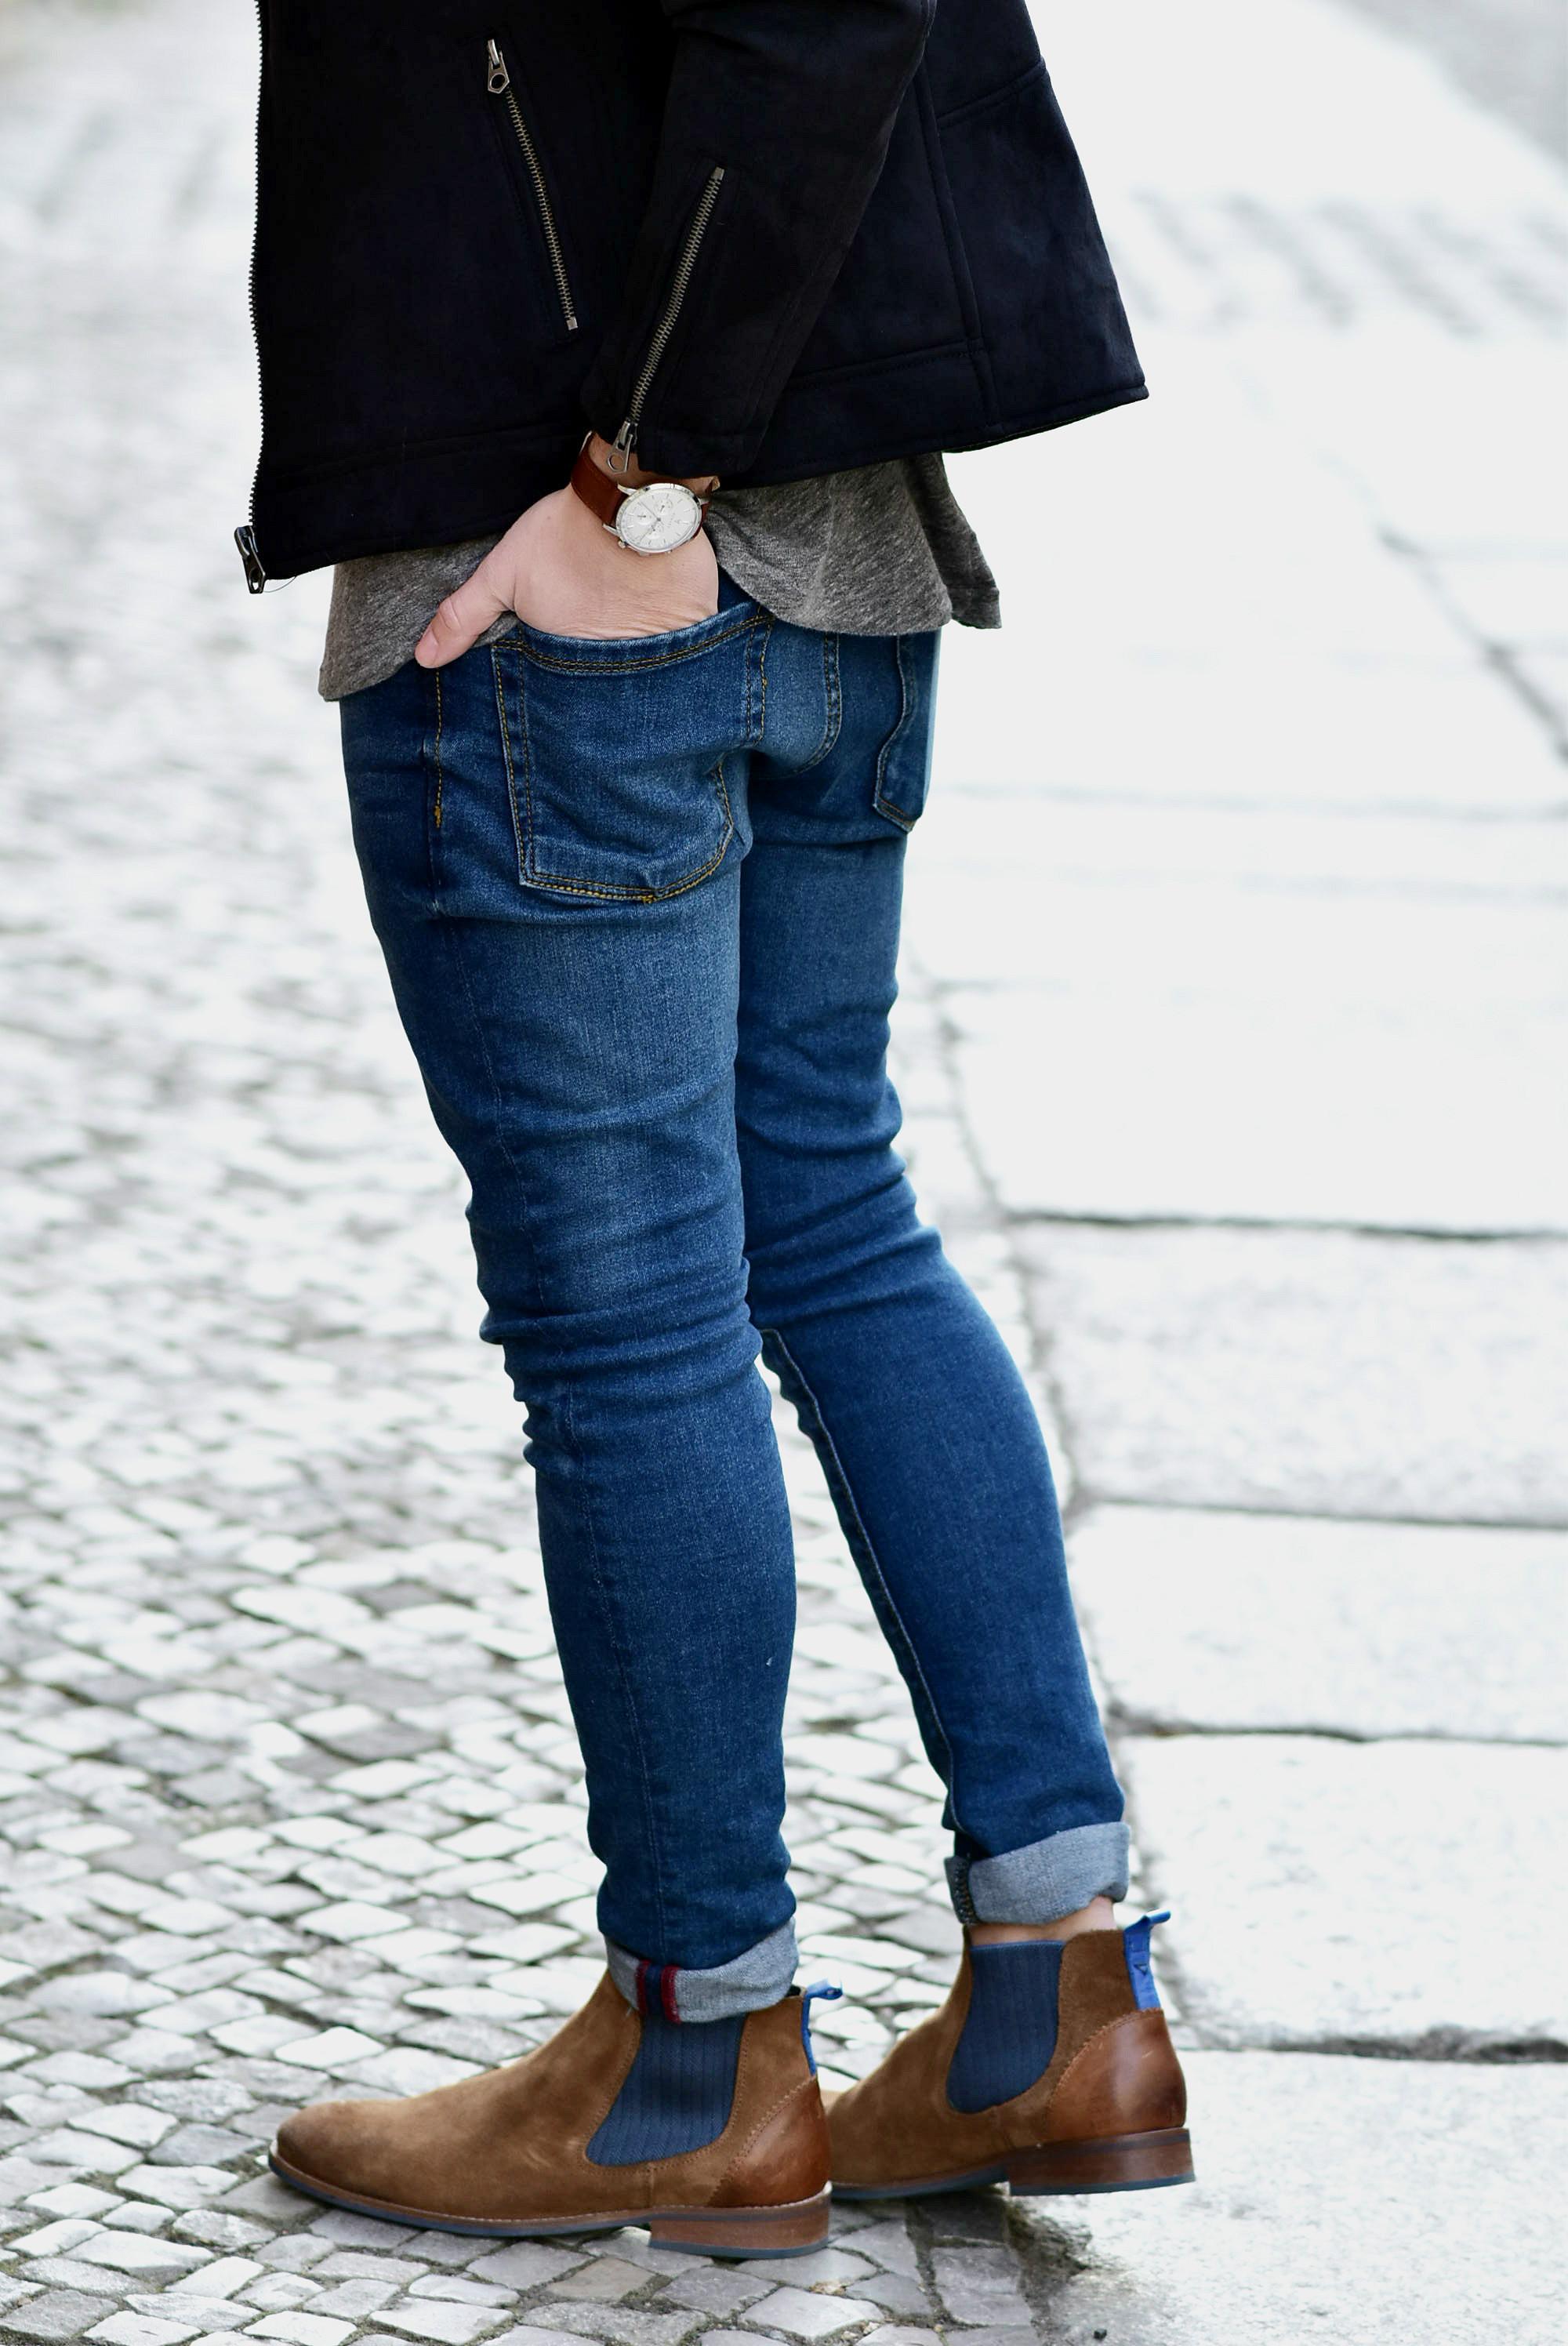 Tommeezjerry-Styleblog-Männerblog-Modeblog-Berlin-Outfit-Streetlook-Skinny-Jeans-Wildederbikerjacke-Bikerjacke-Chlesea-Boots-Renardwatch